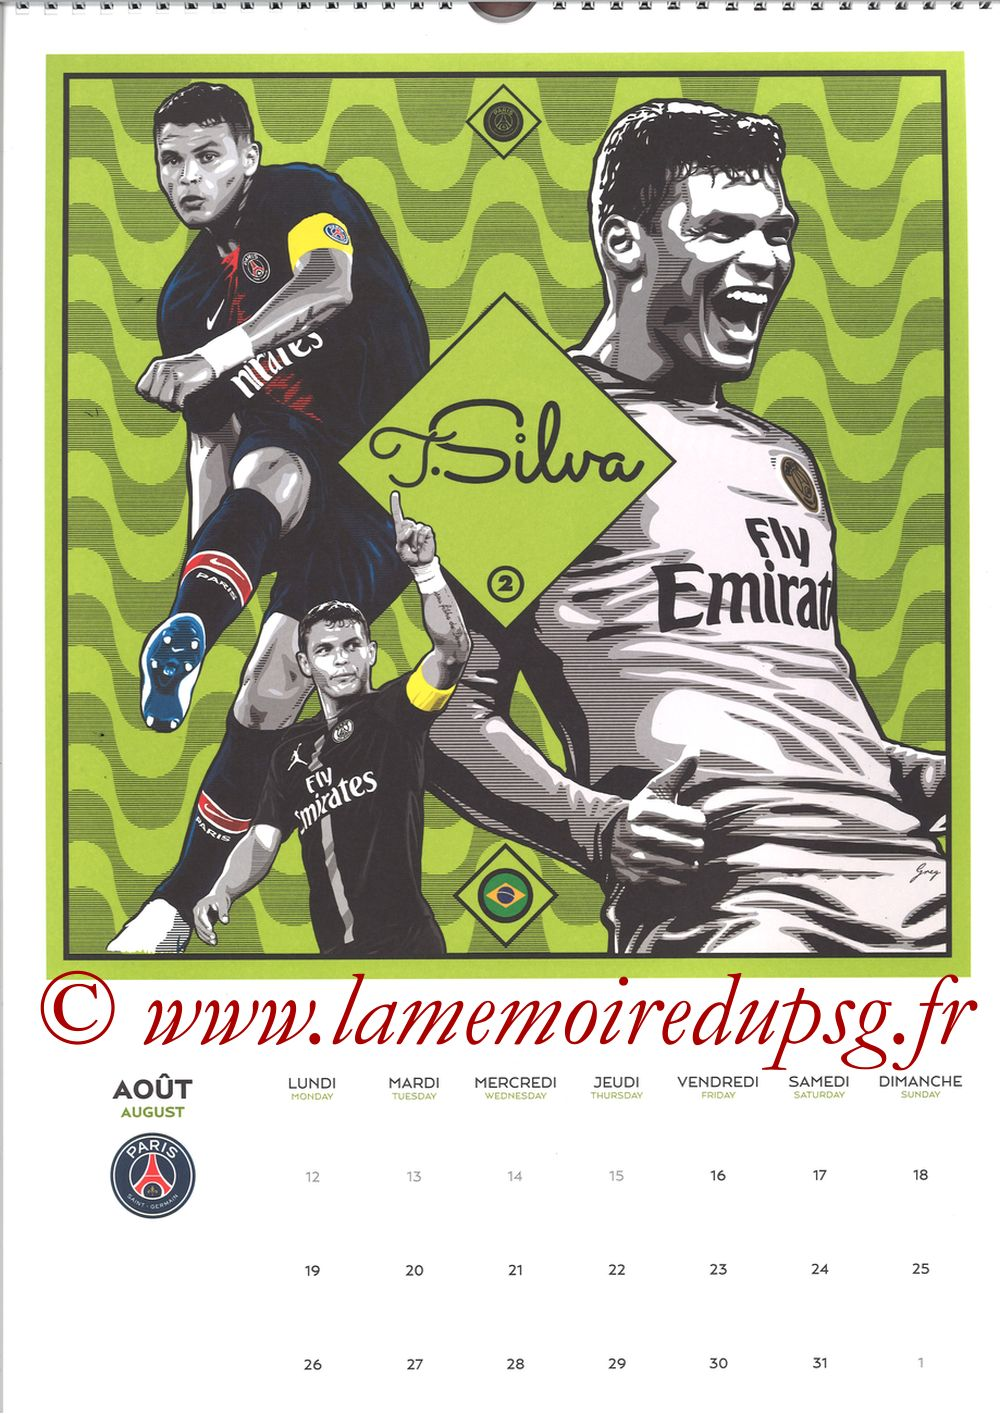 Calendrier PSG 2019 - Page 16 - Thiago SILVA